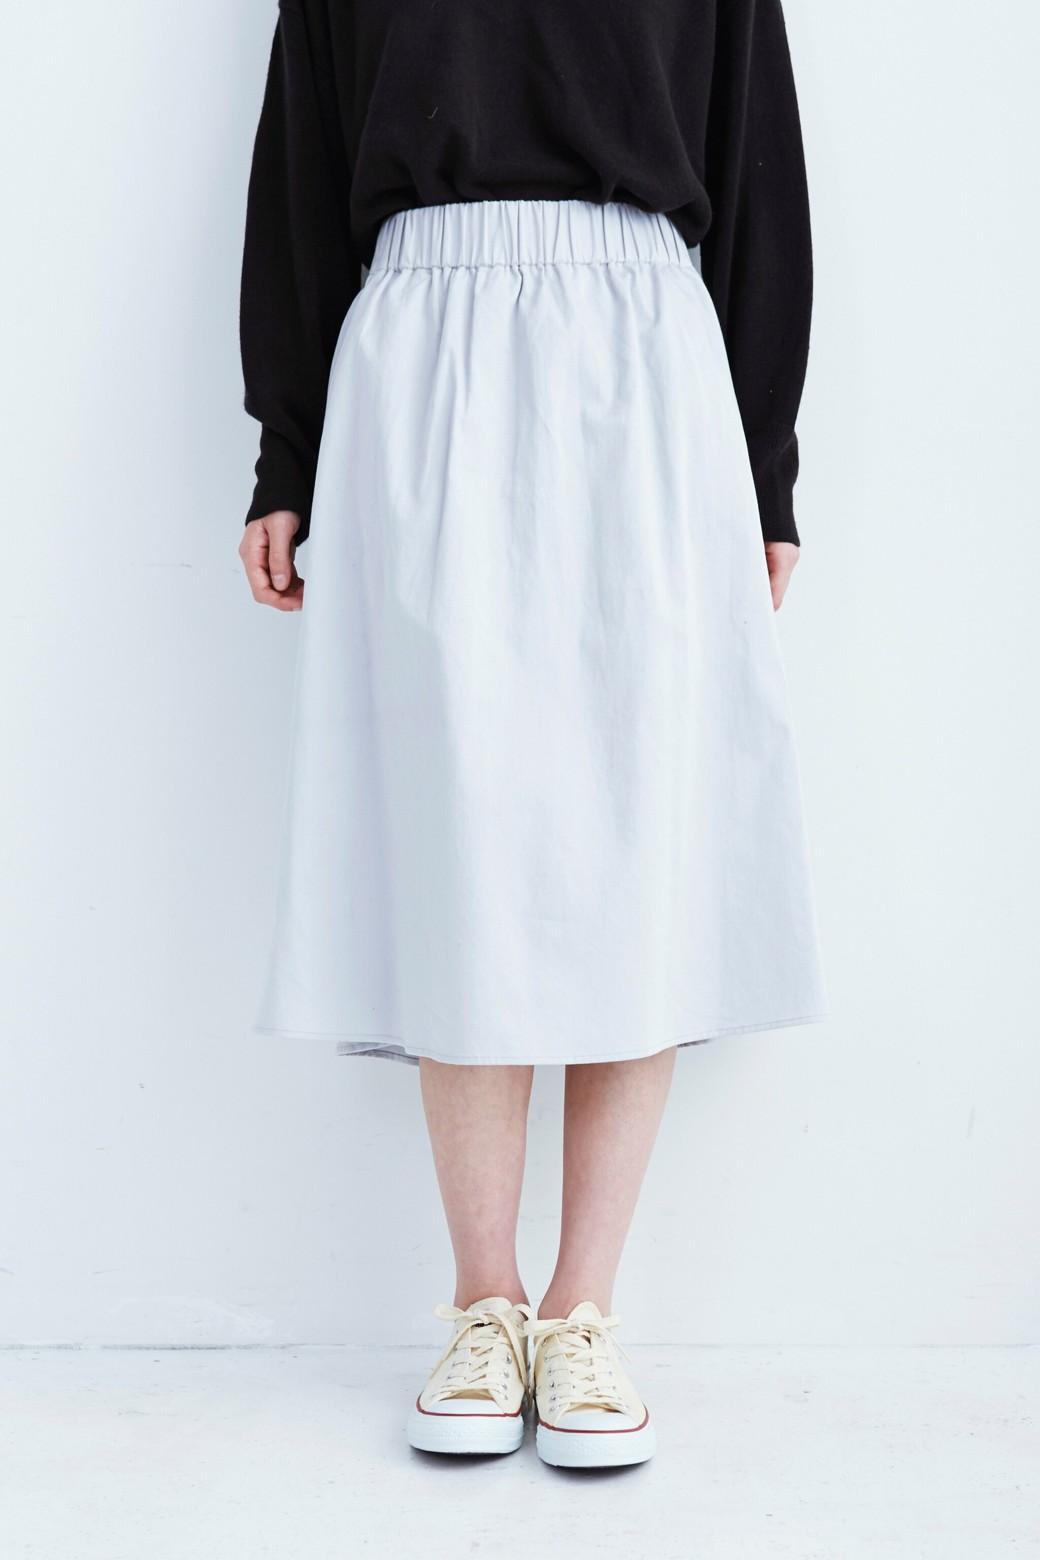 haco! ミモレ丈のフレアースカート by que made me <ライトグレー>の商品写真9